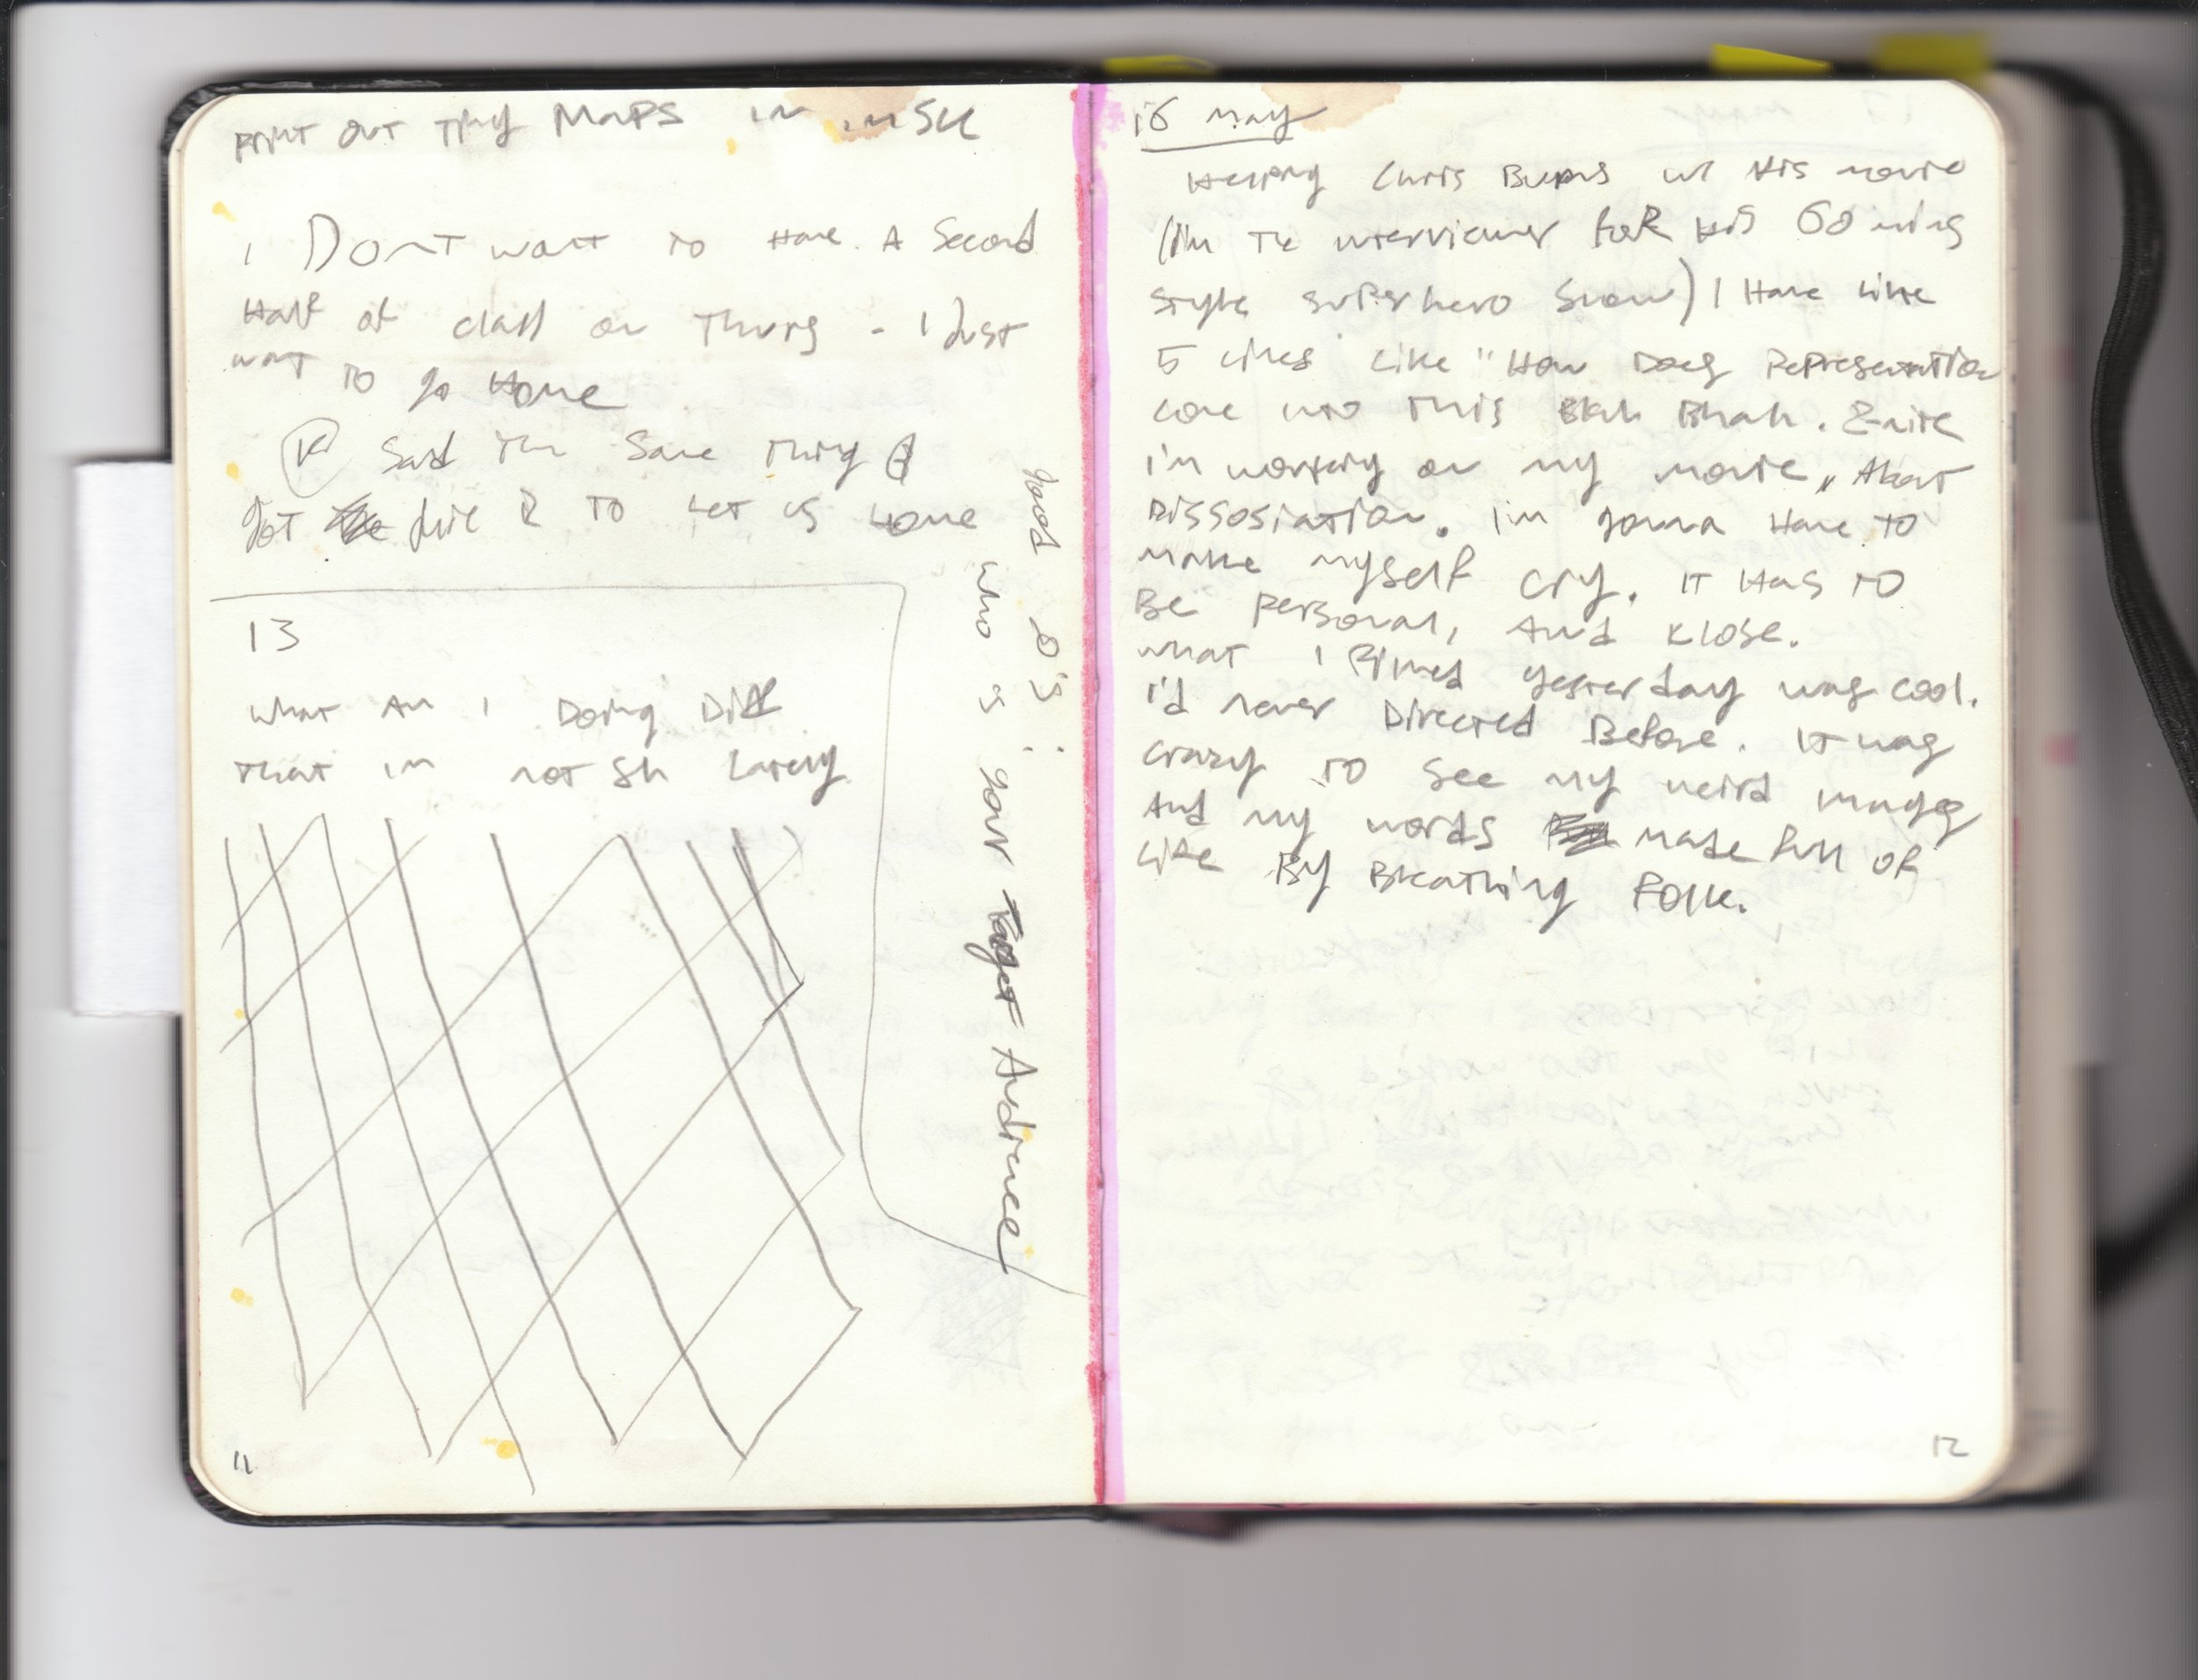 j10_Page_012.jpg